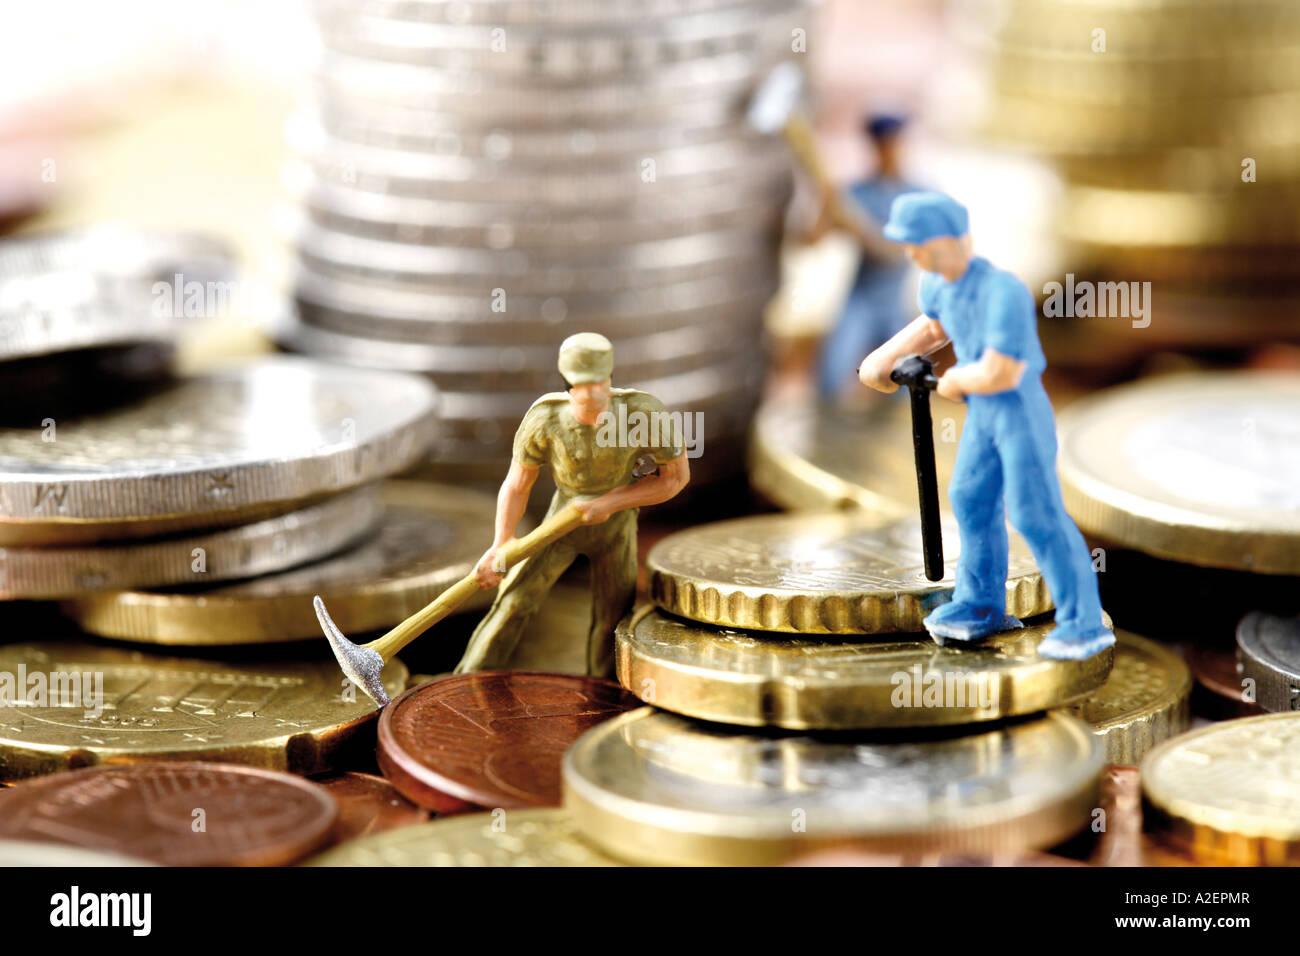 Figurines digging money, close-up Stock Photo